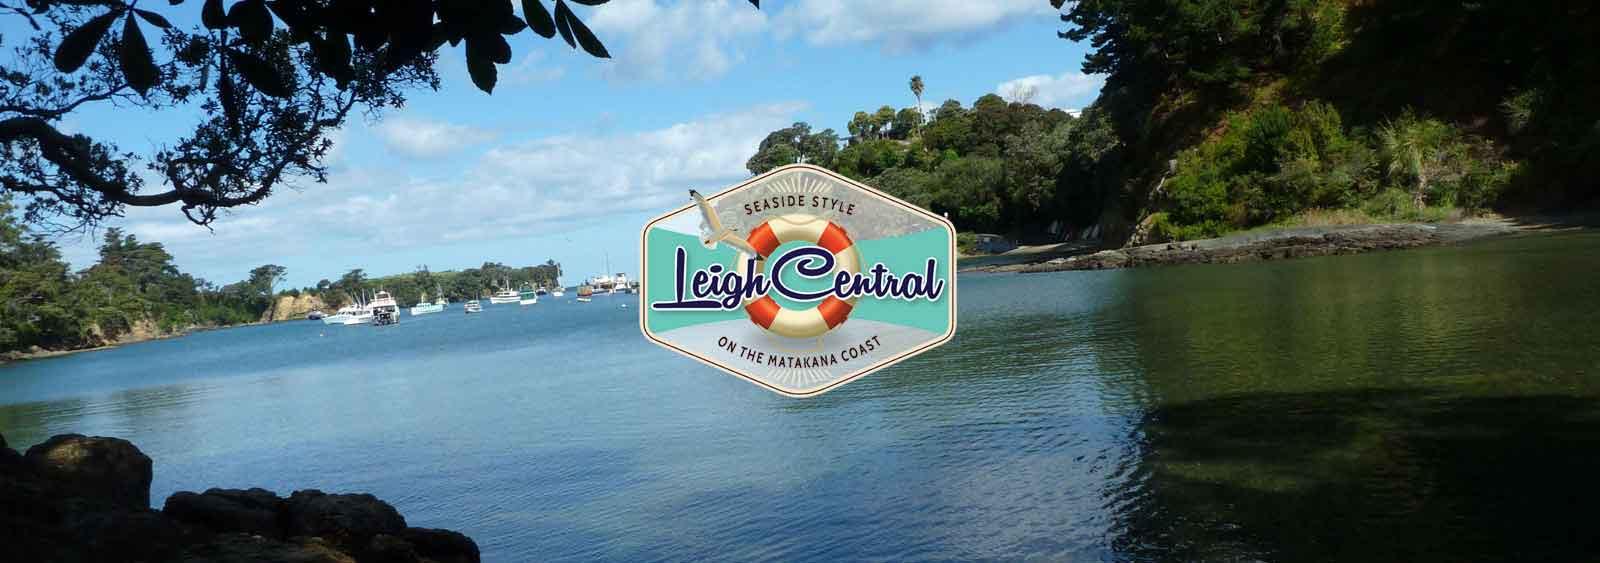 Leigh Central, Leigh Harbour